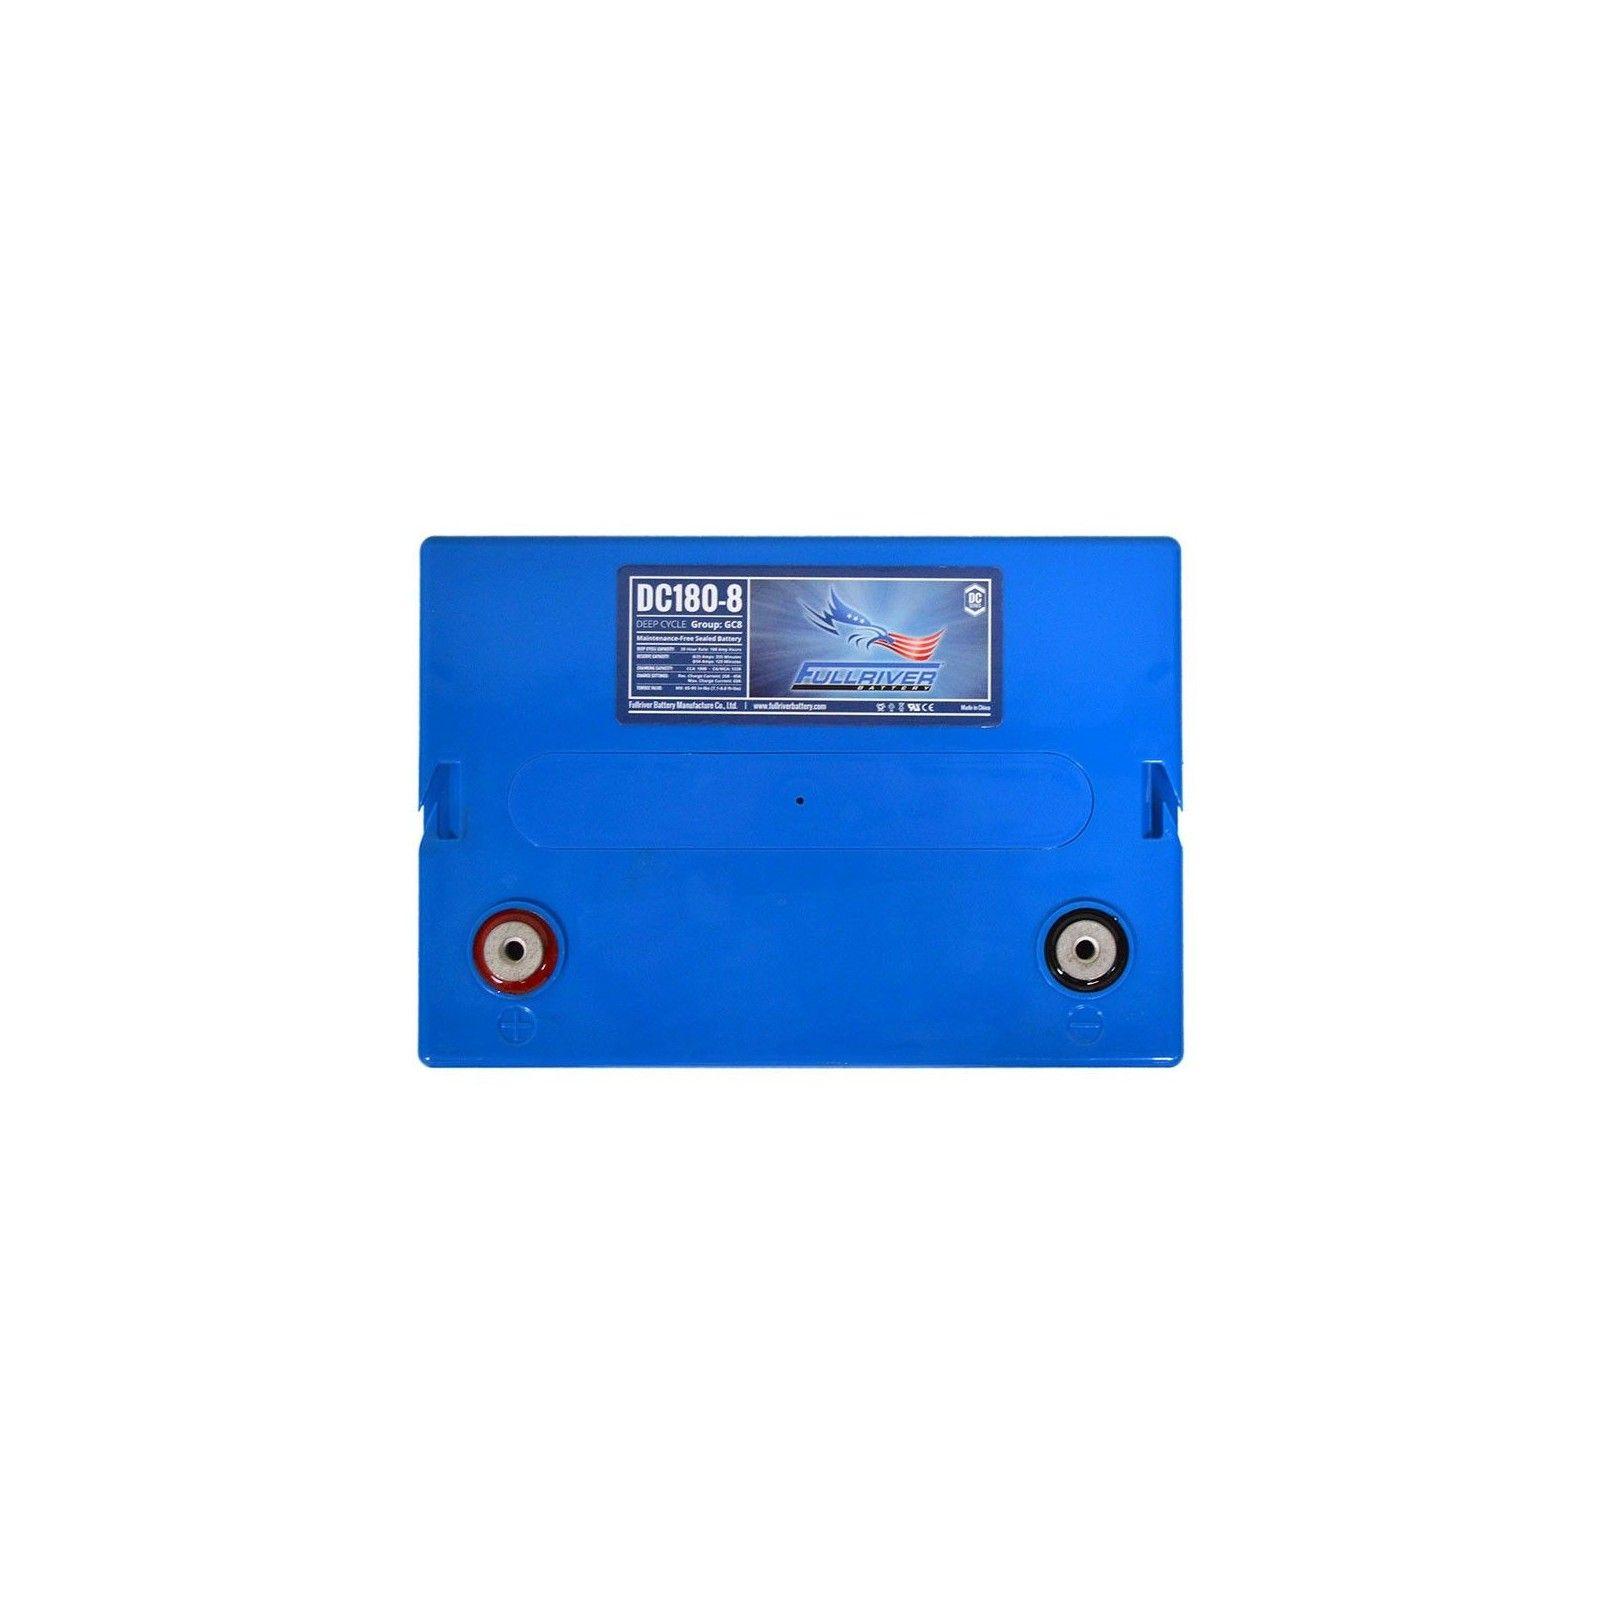 Batería Fullriver DC180-8B 180Ah 8V Dc FULLRIVER - 1